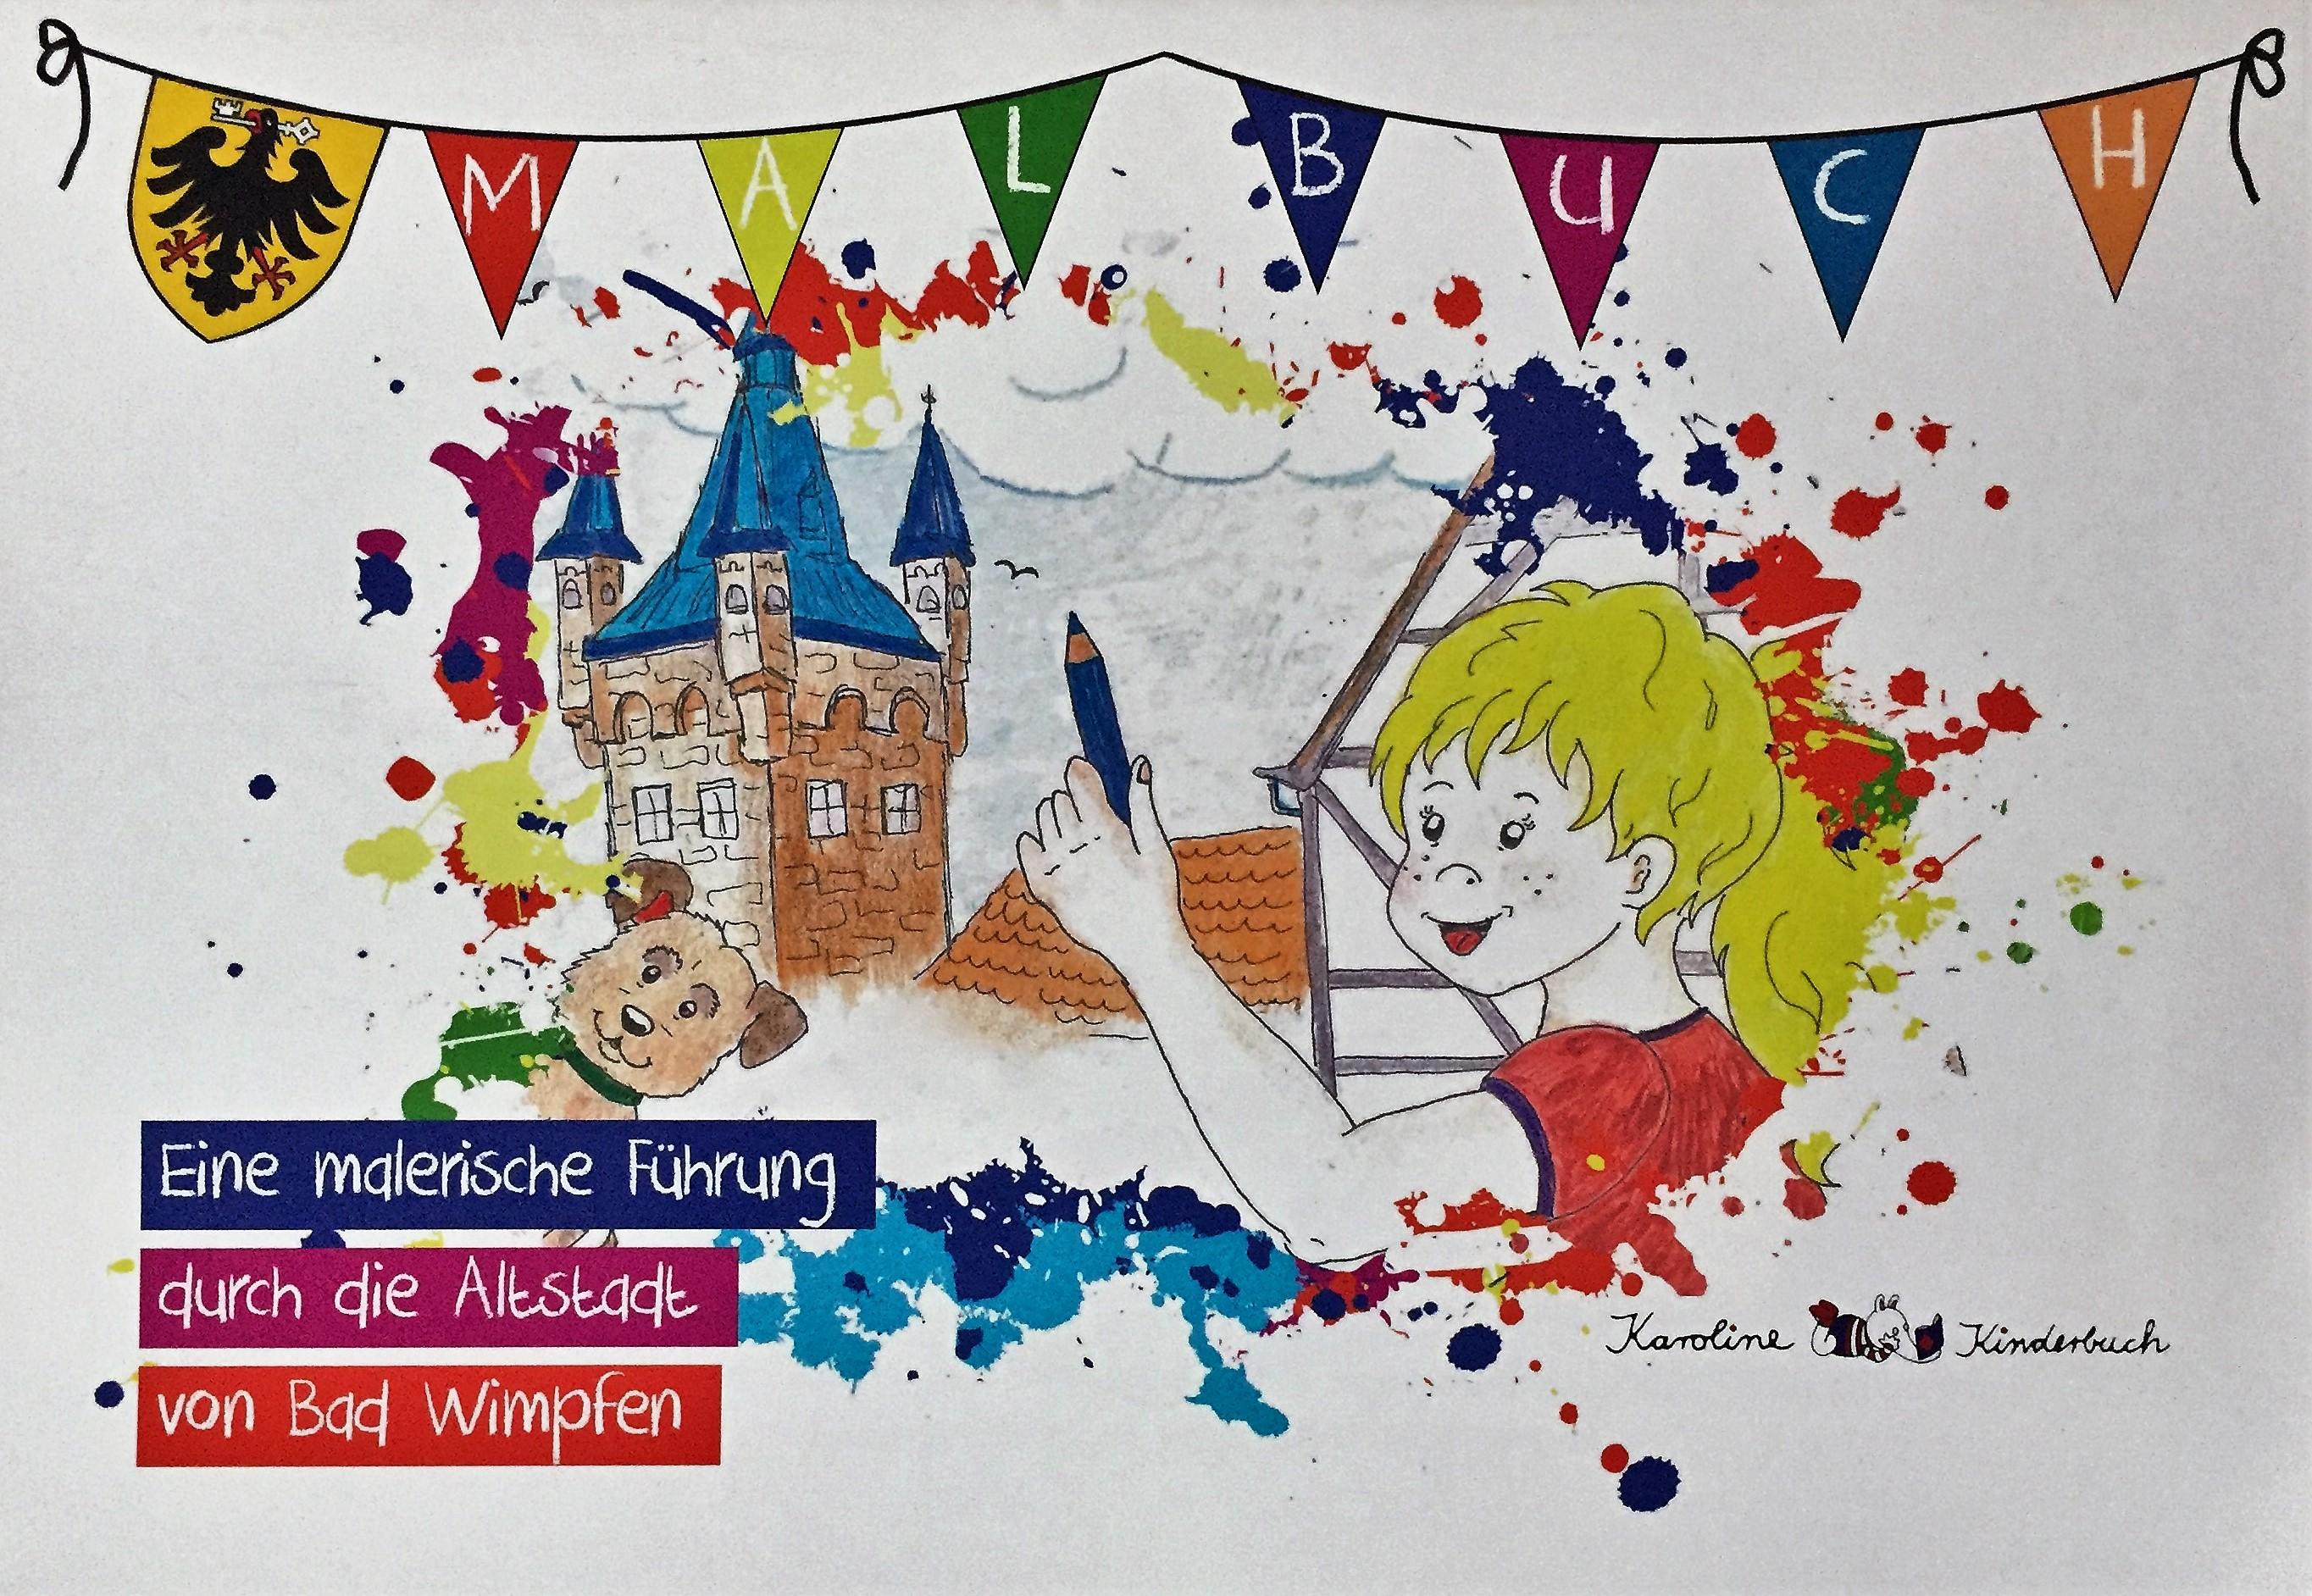 Wimpfener Malbuch Cover